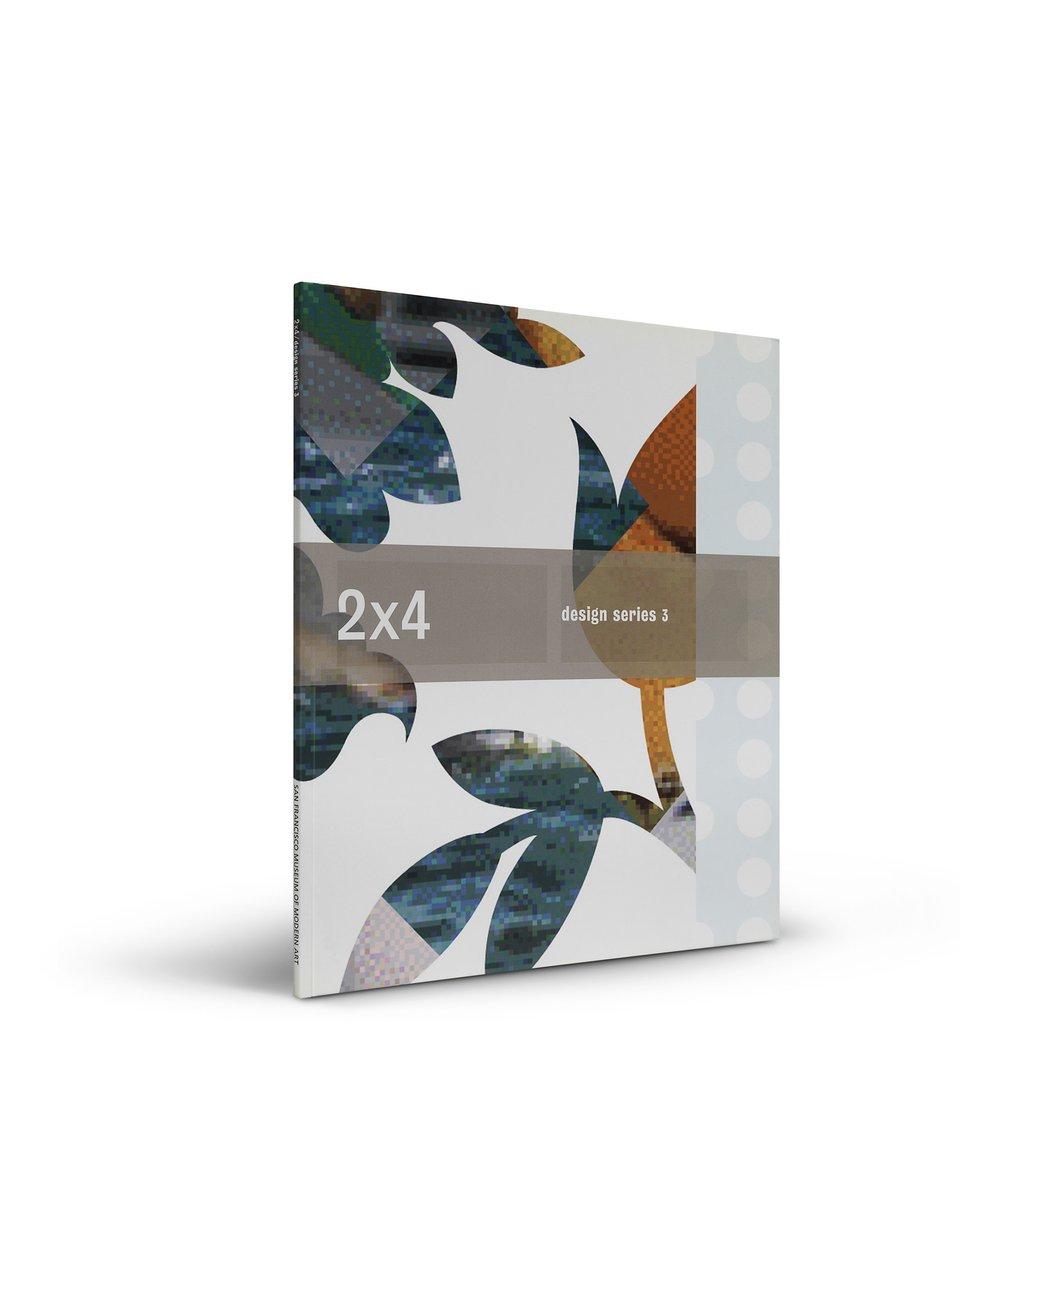 2x4/design series 3 publication cover